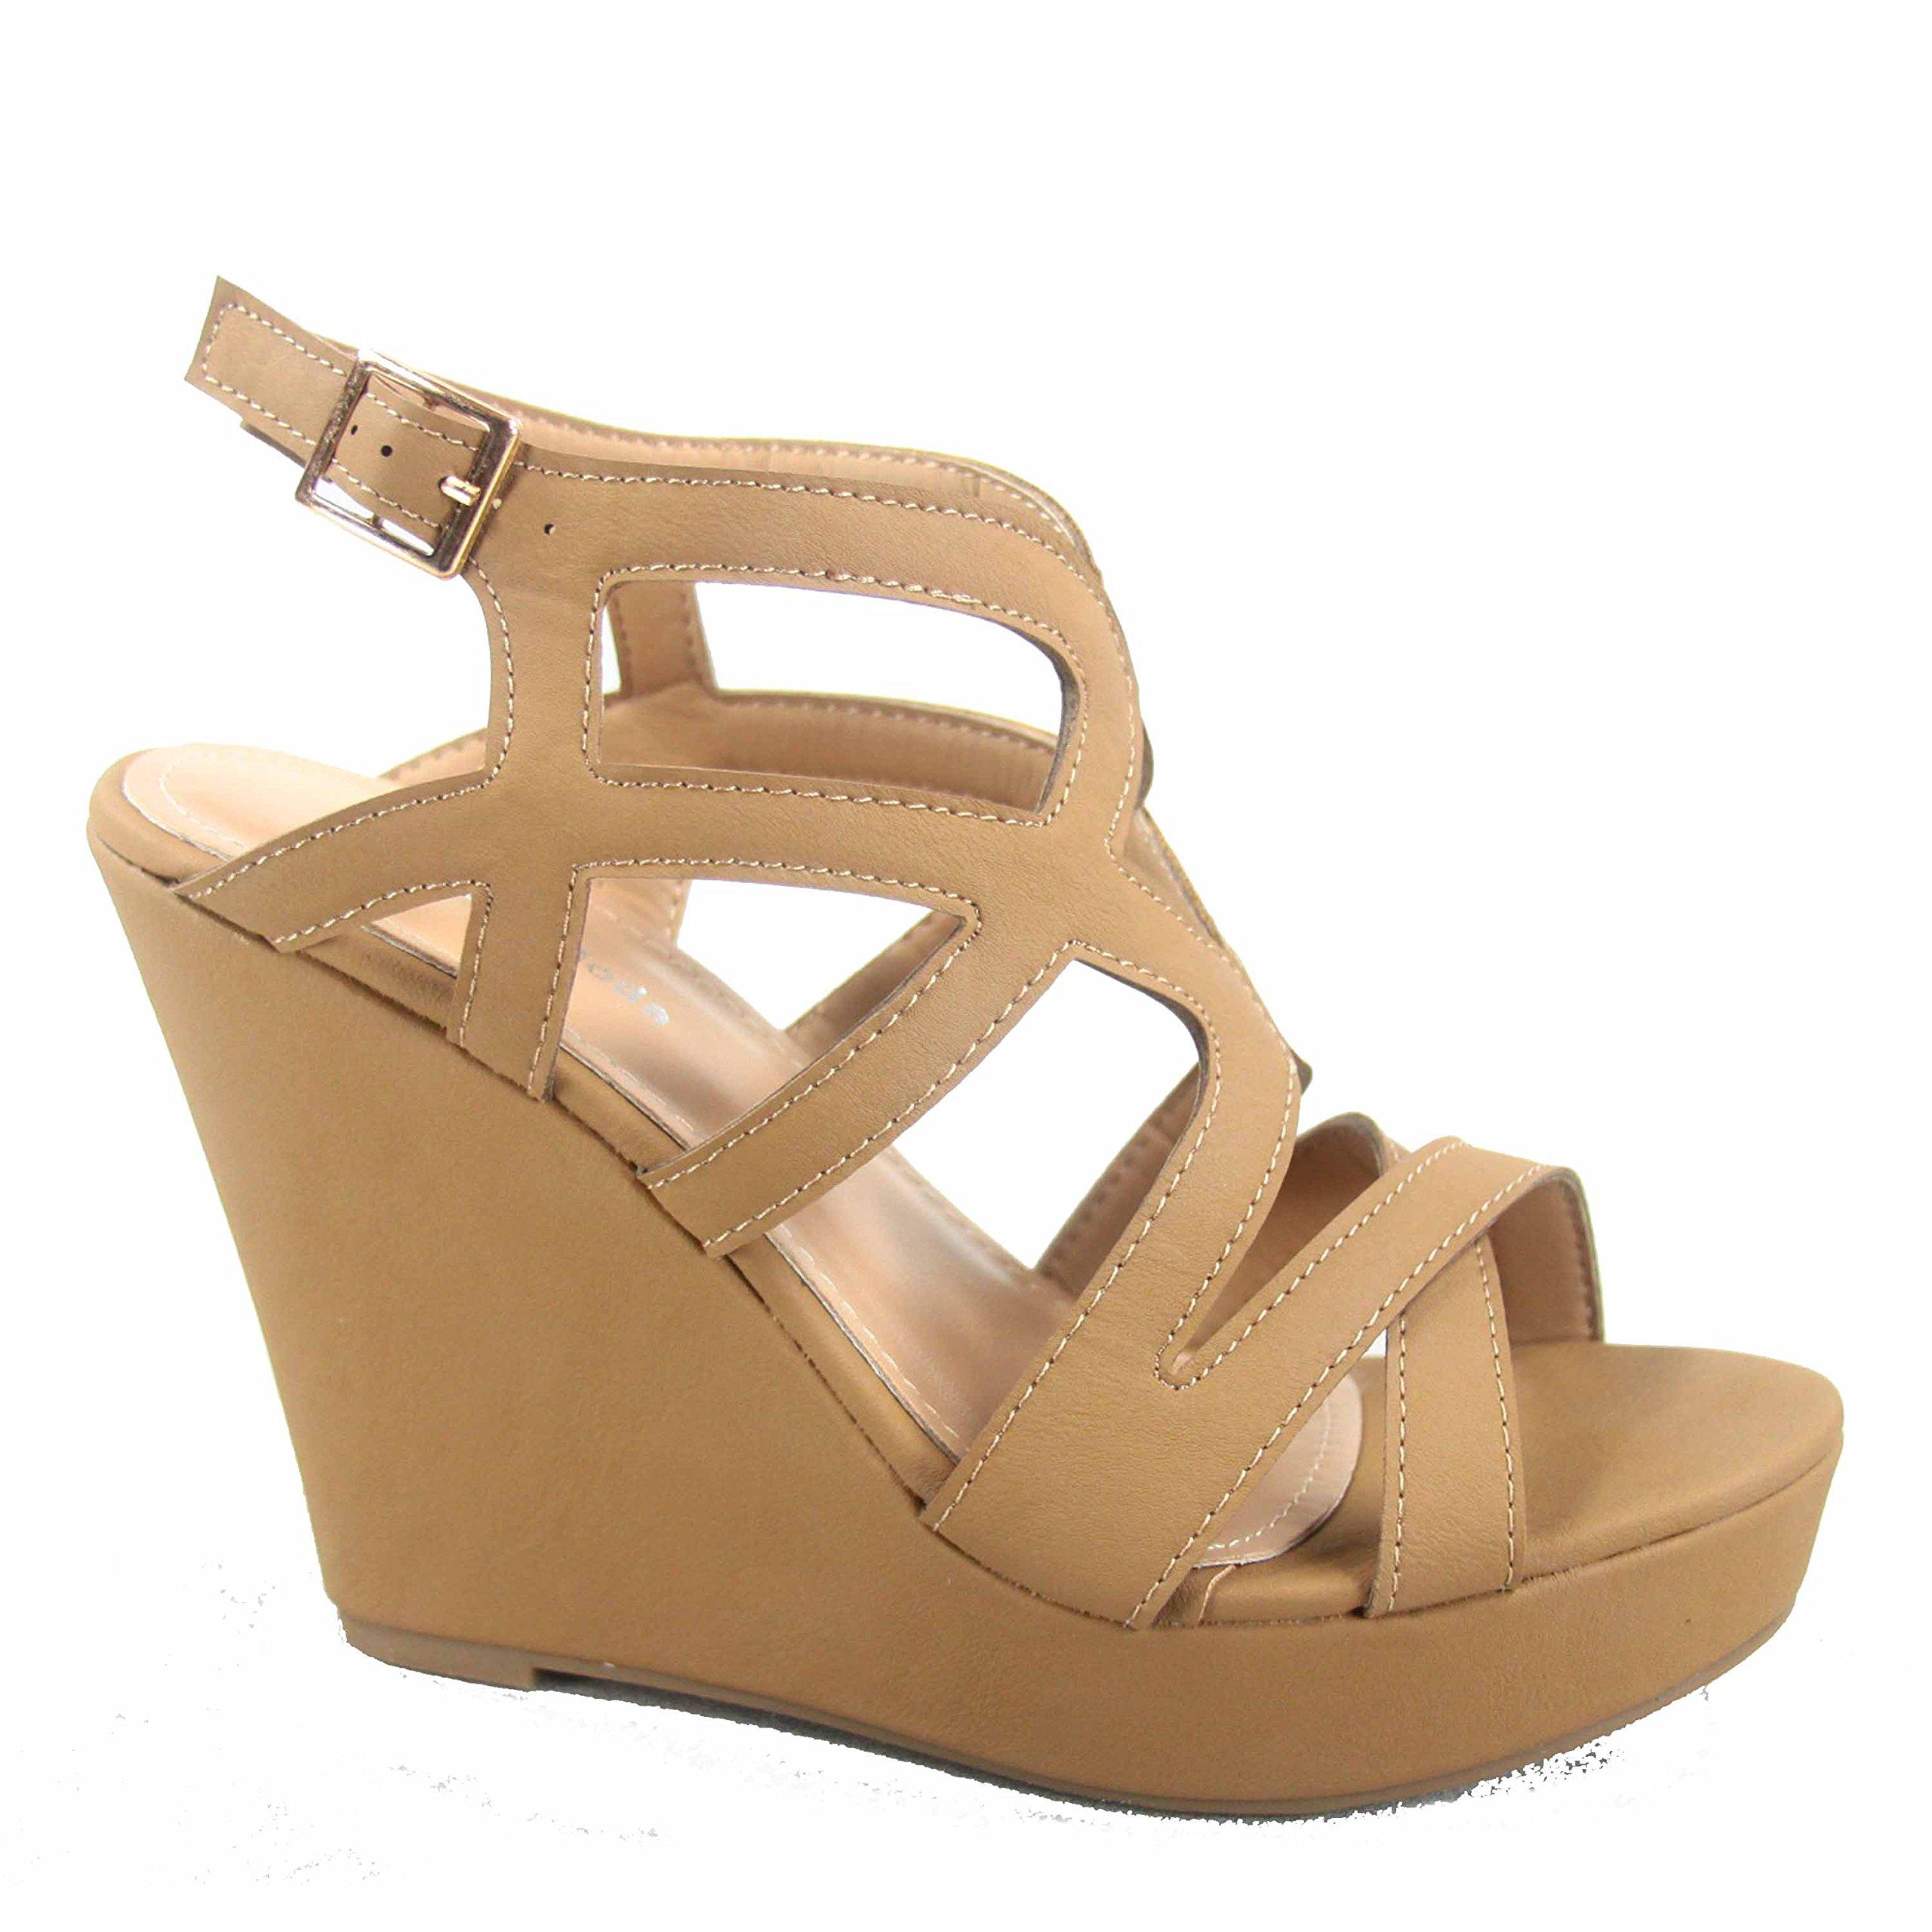 Top Moda Cathy-55 Women's Fashion Strappy Wedge Open Toe Platform Sandal Shoes (8.5 B(M) US, Tan)